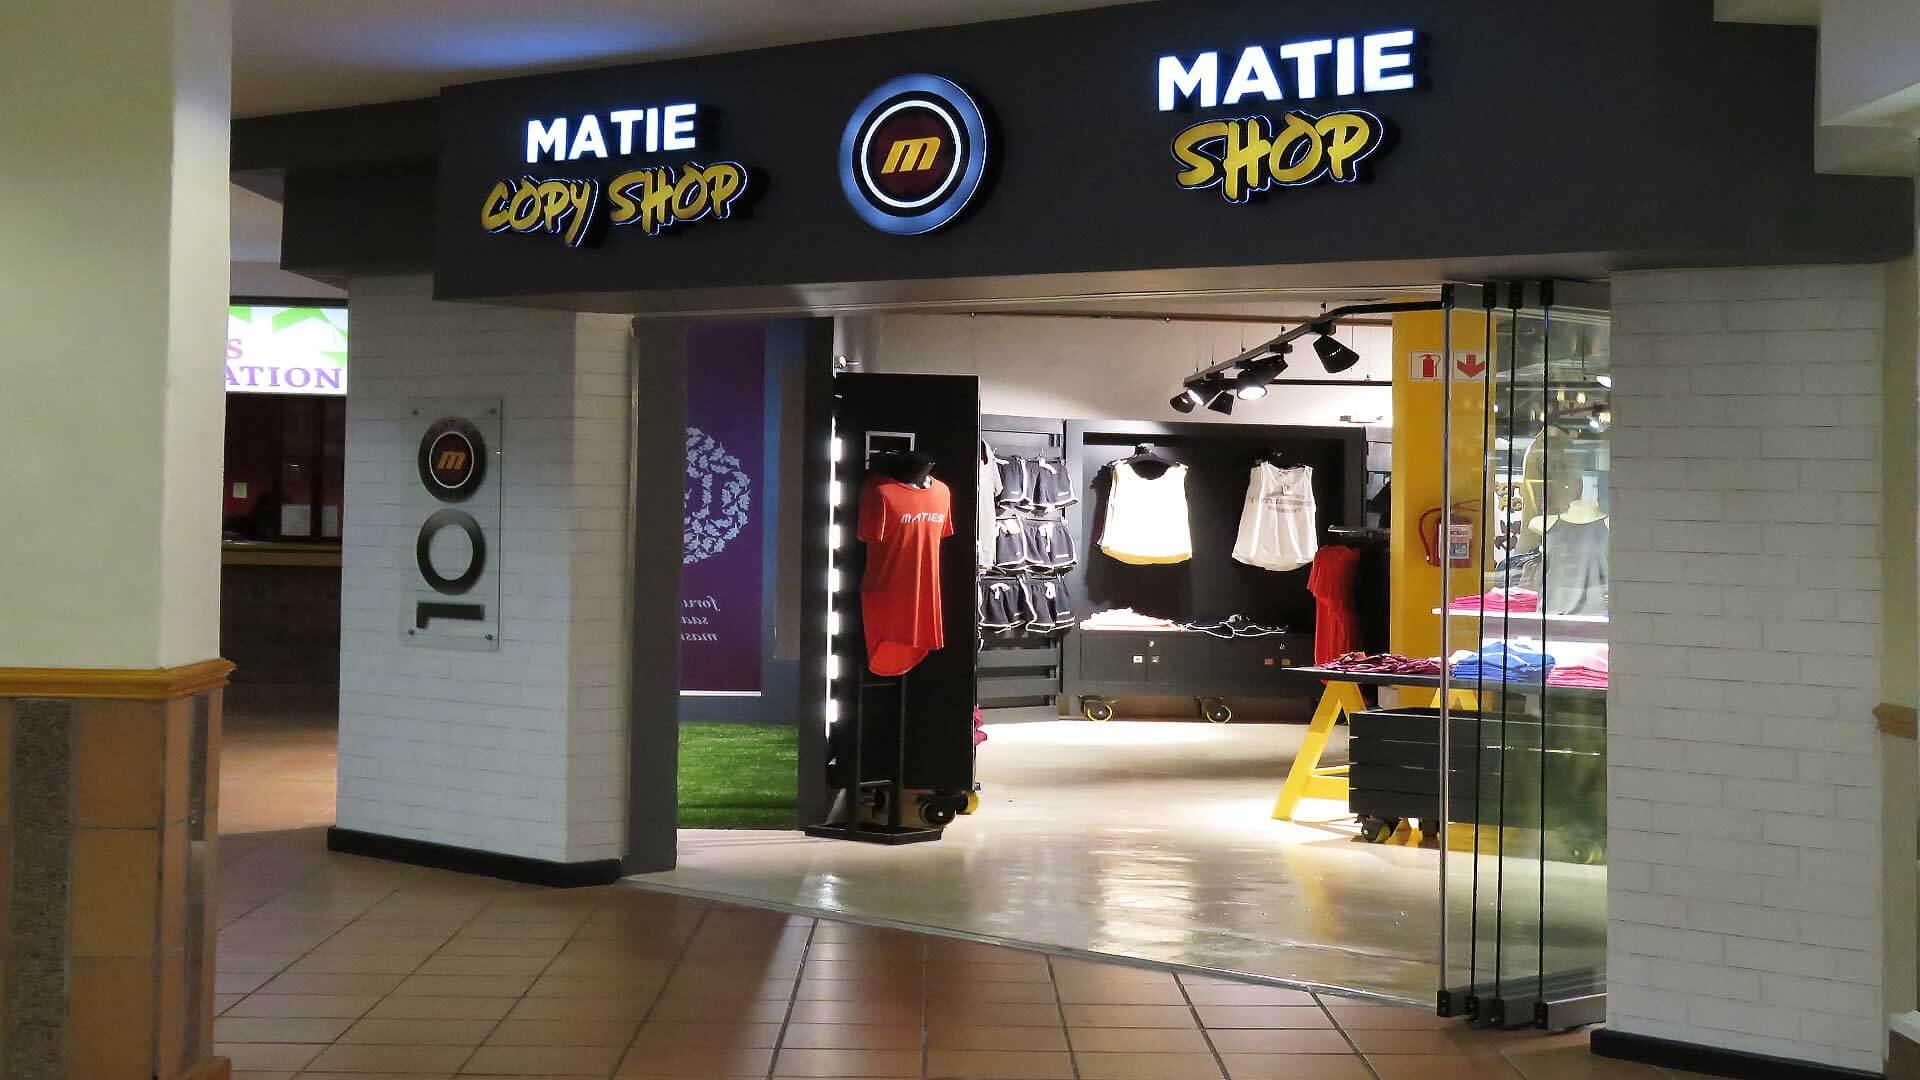 1 Die Matie & Copy Shop